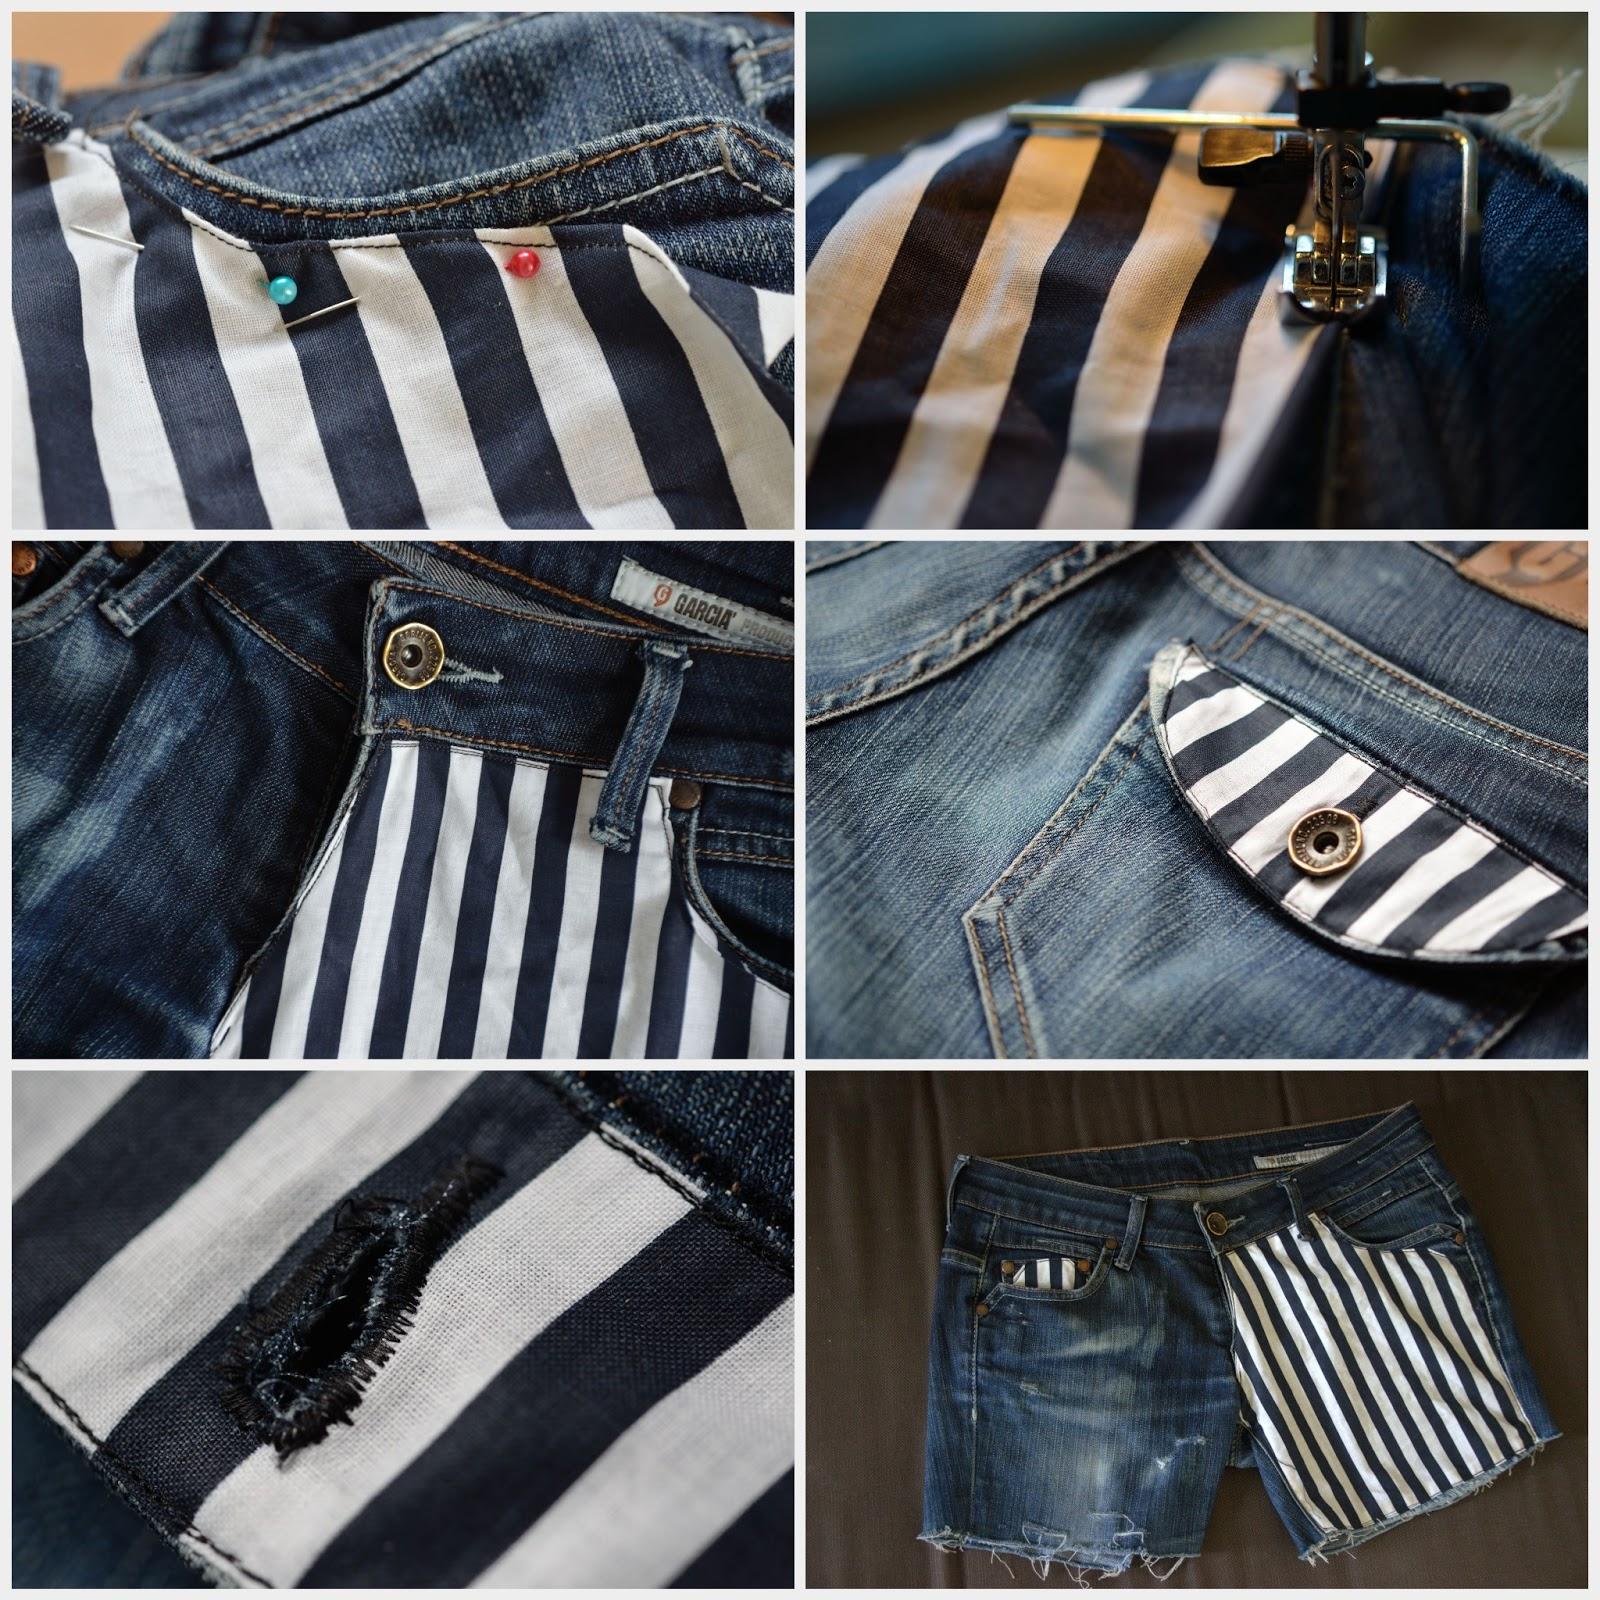 Into Old DiyTurn ShortsMartie's Jeans Your New Diy Y7g6ybf